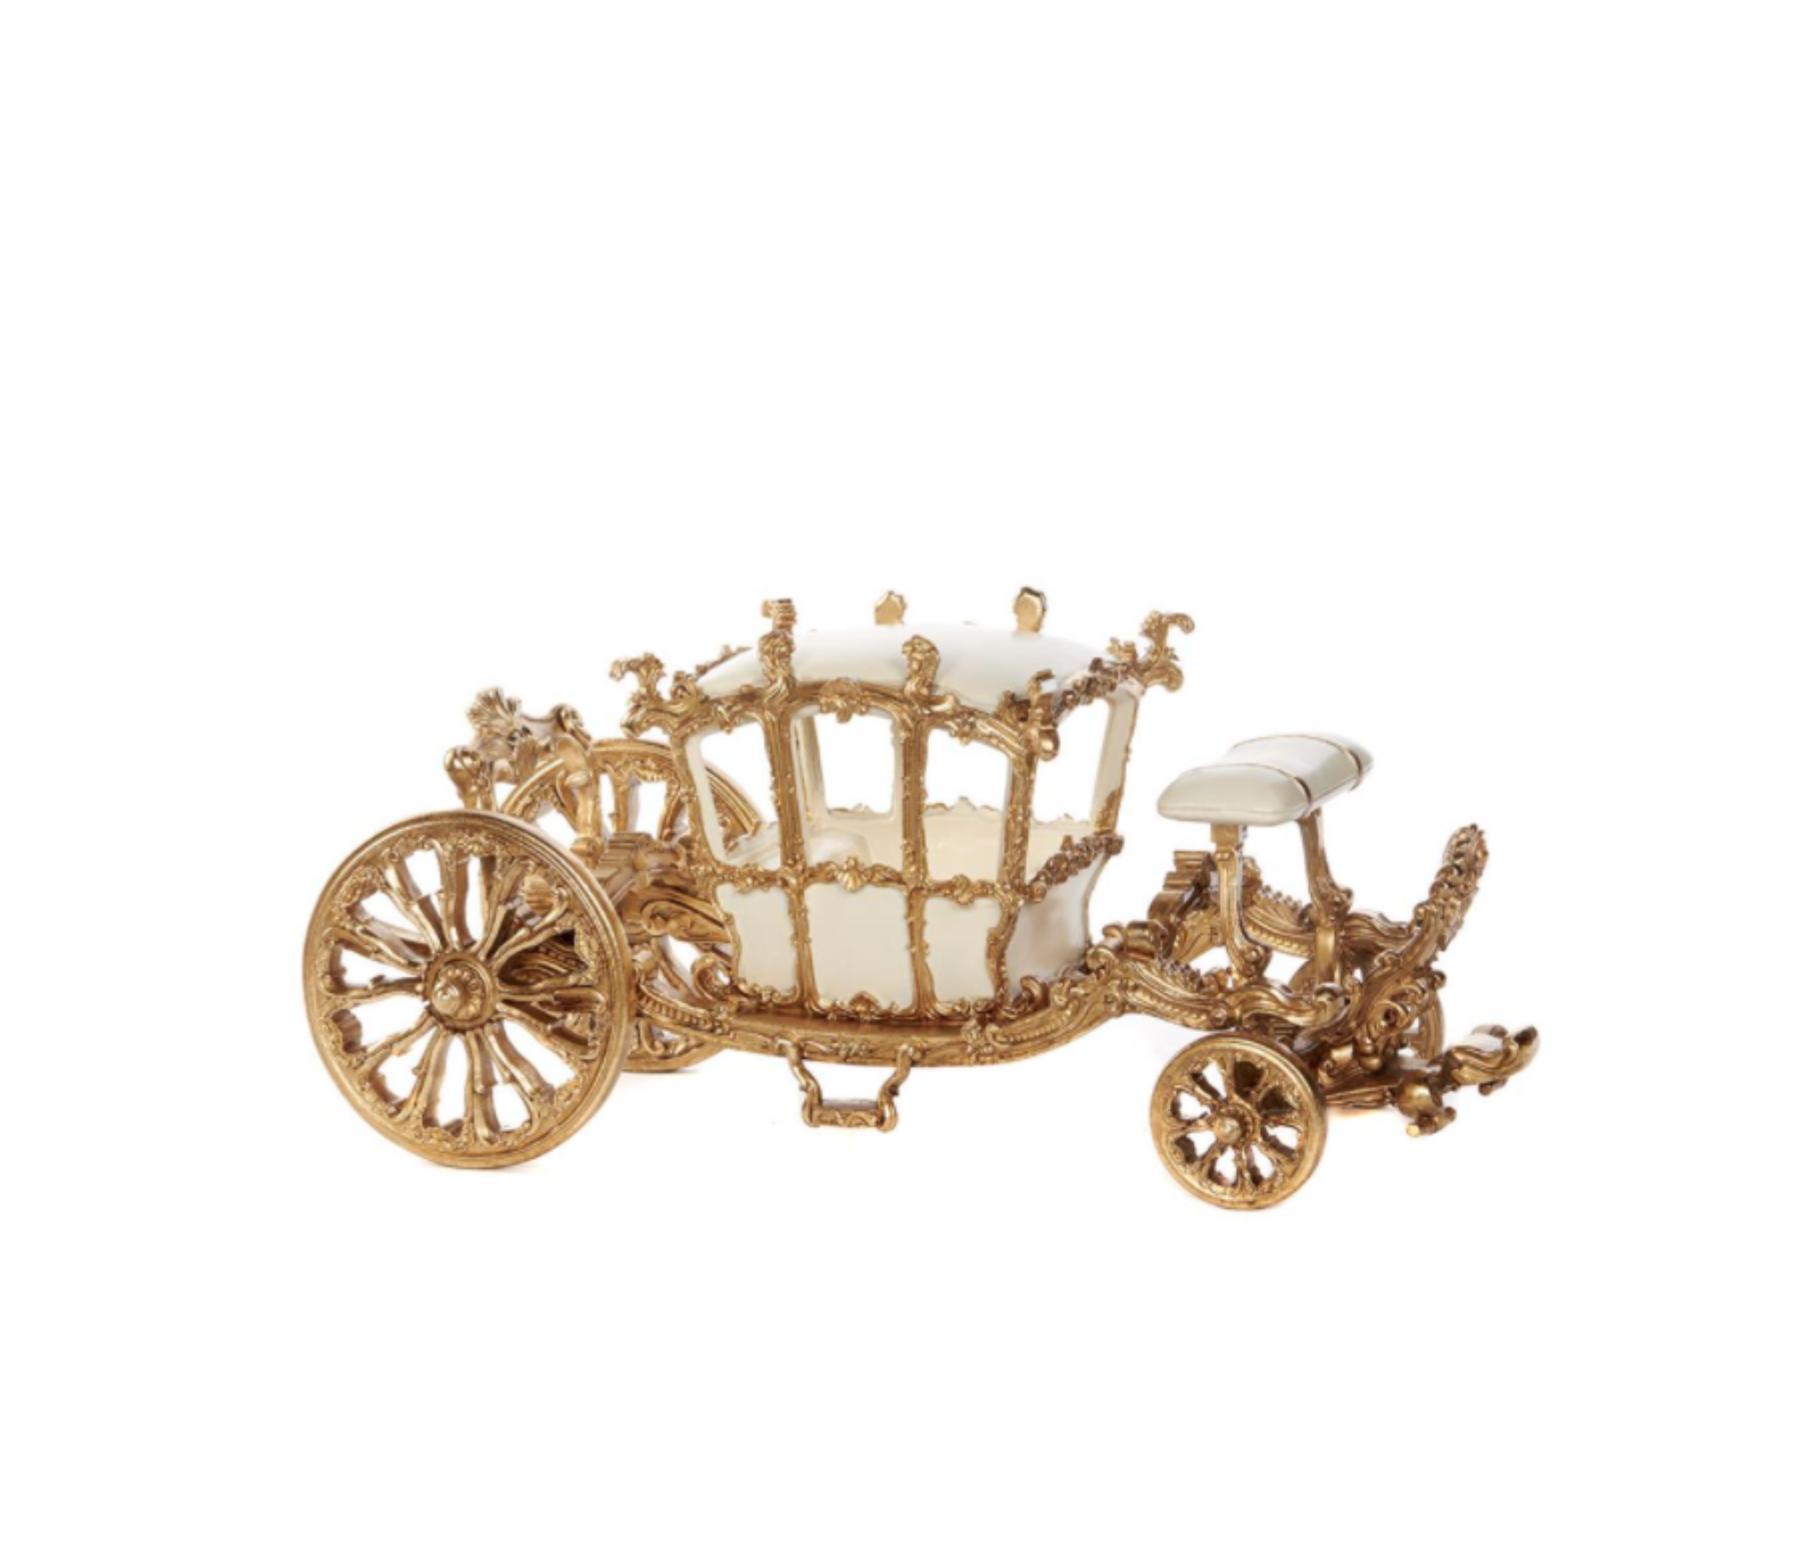 Goodwill Miniatuur gouden koets - L57 cm